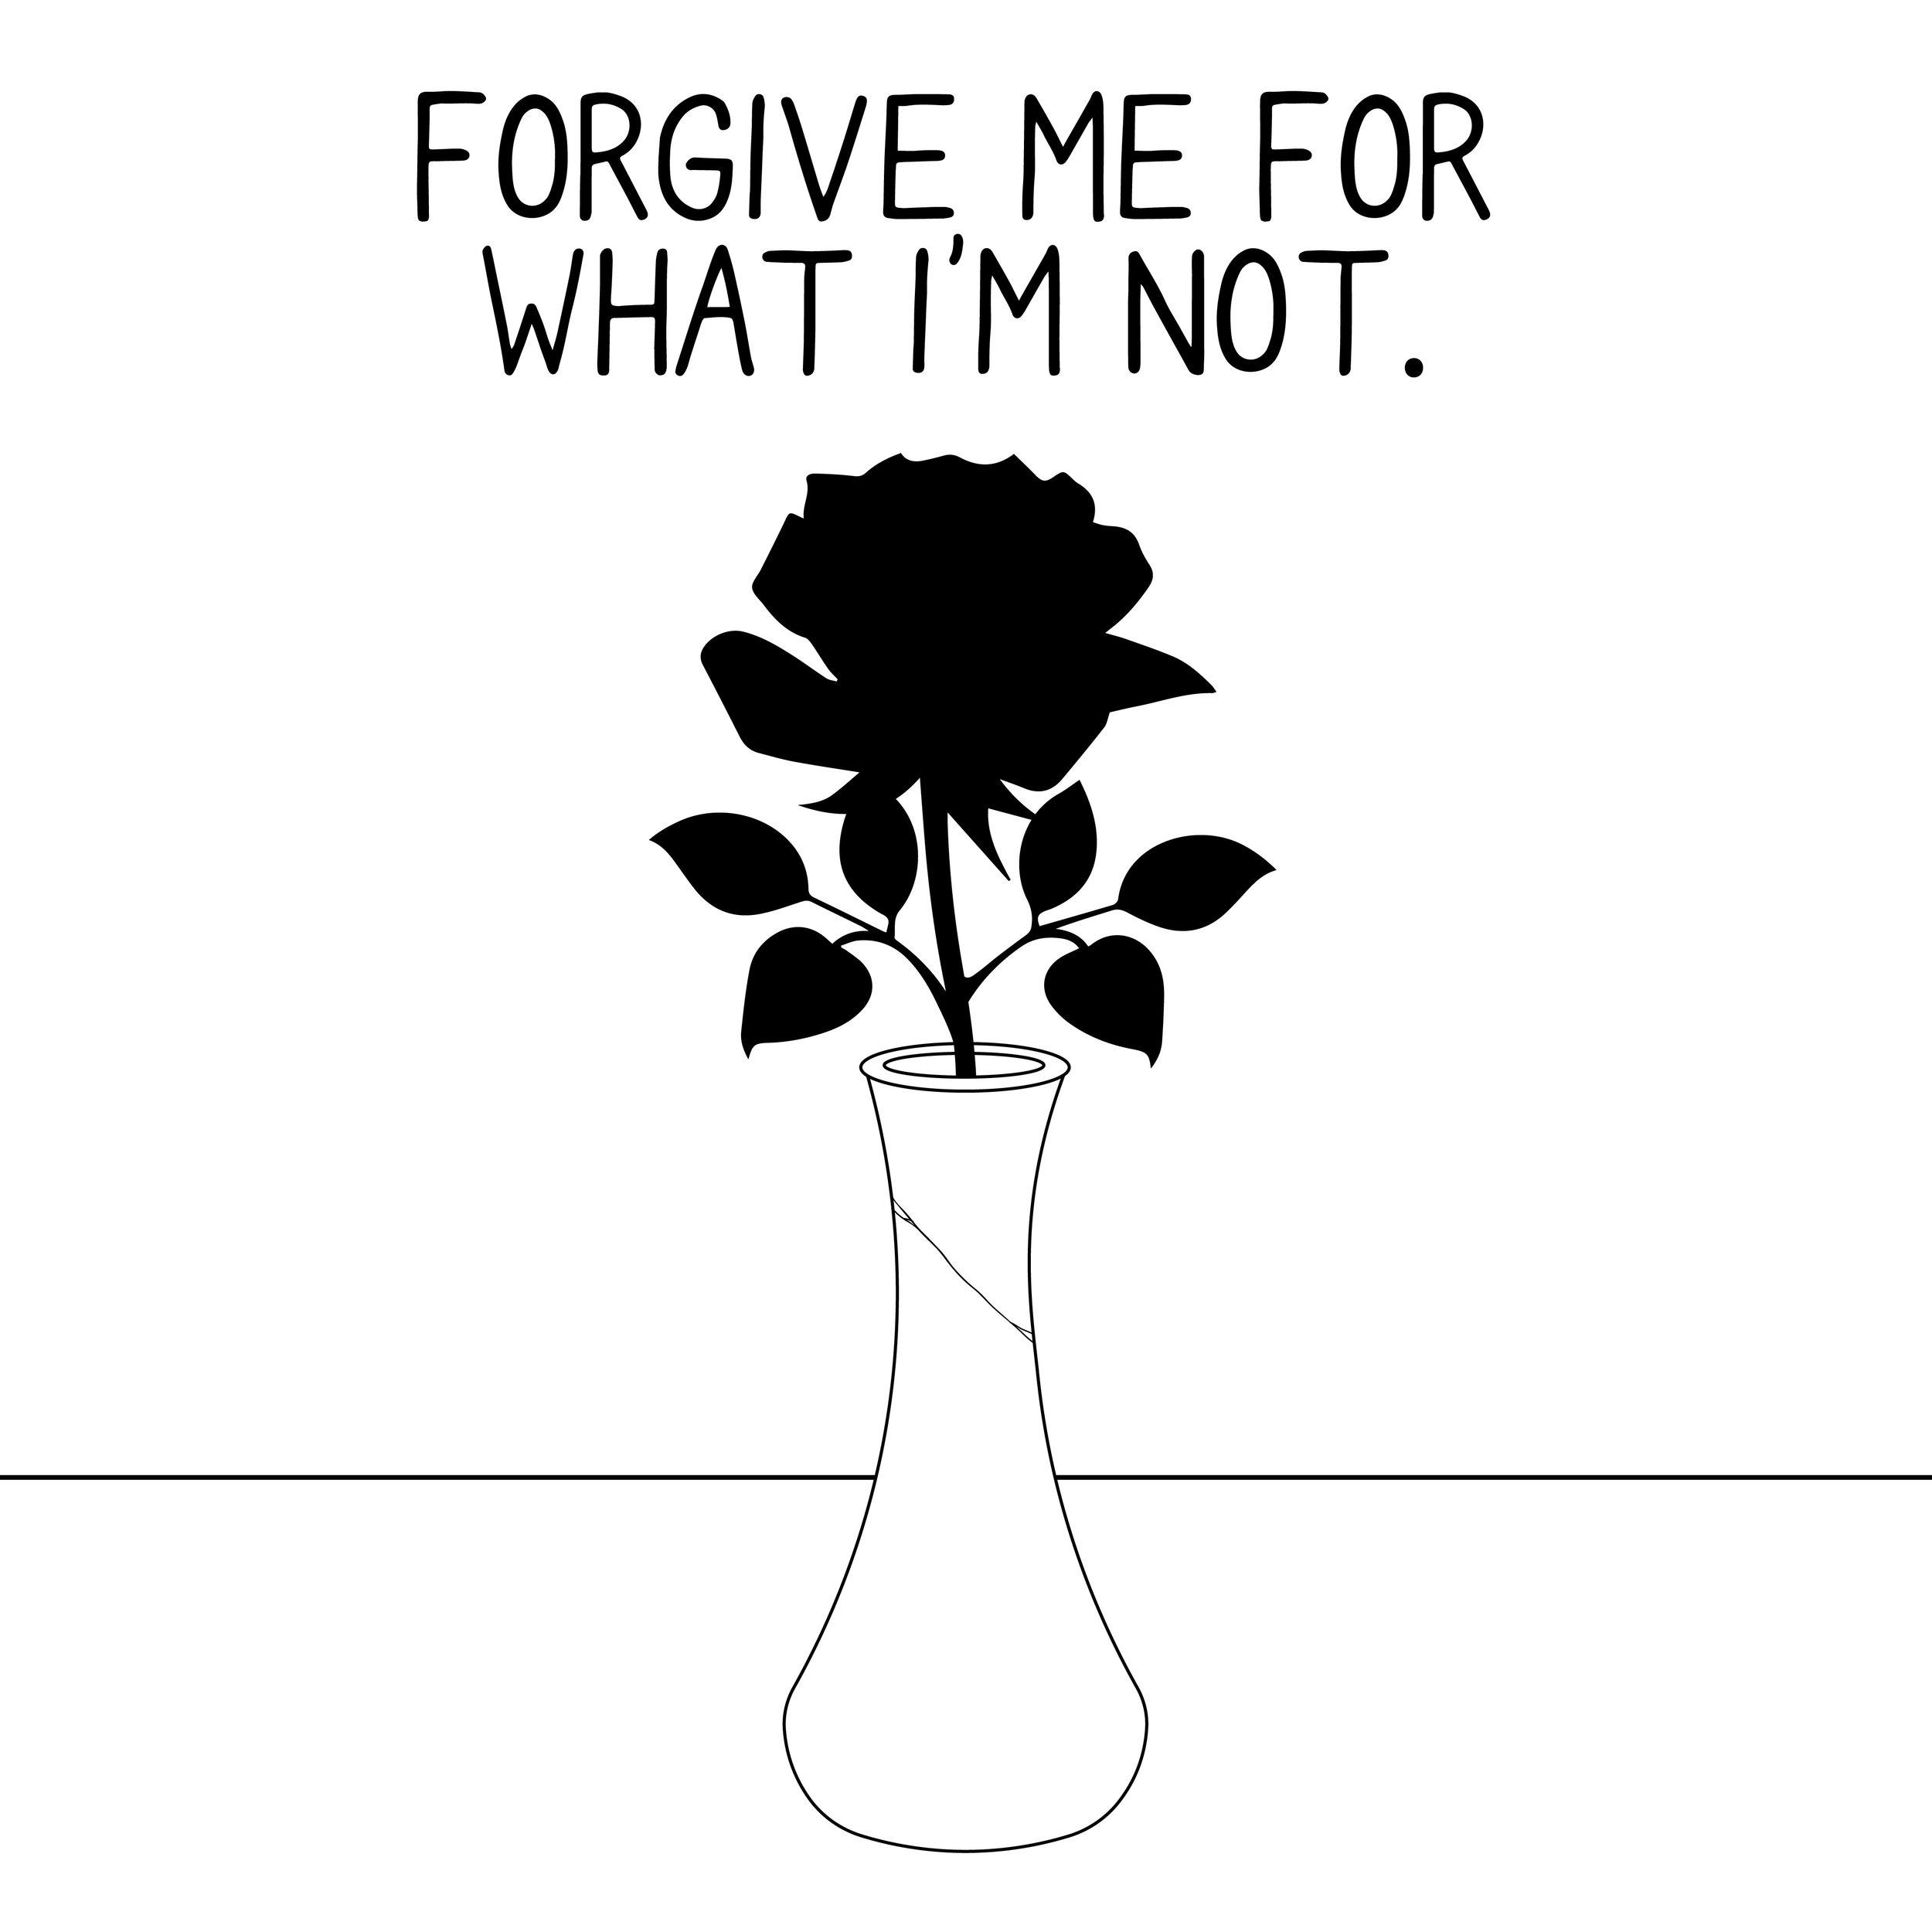 forgivemeforwhatimnot-01.jpg